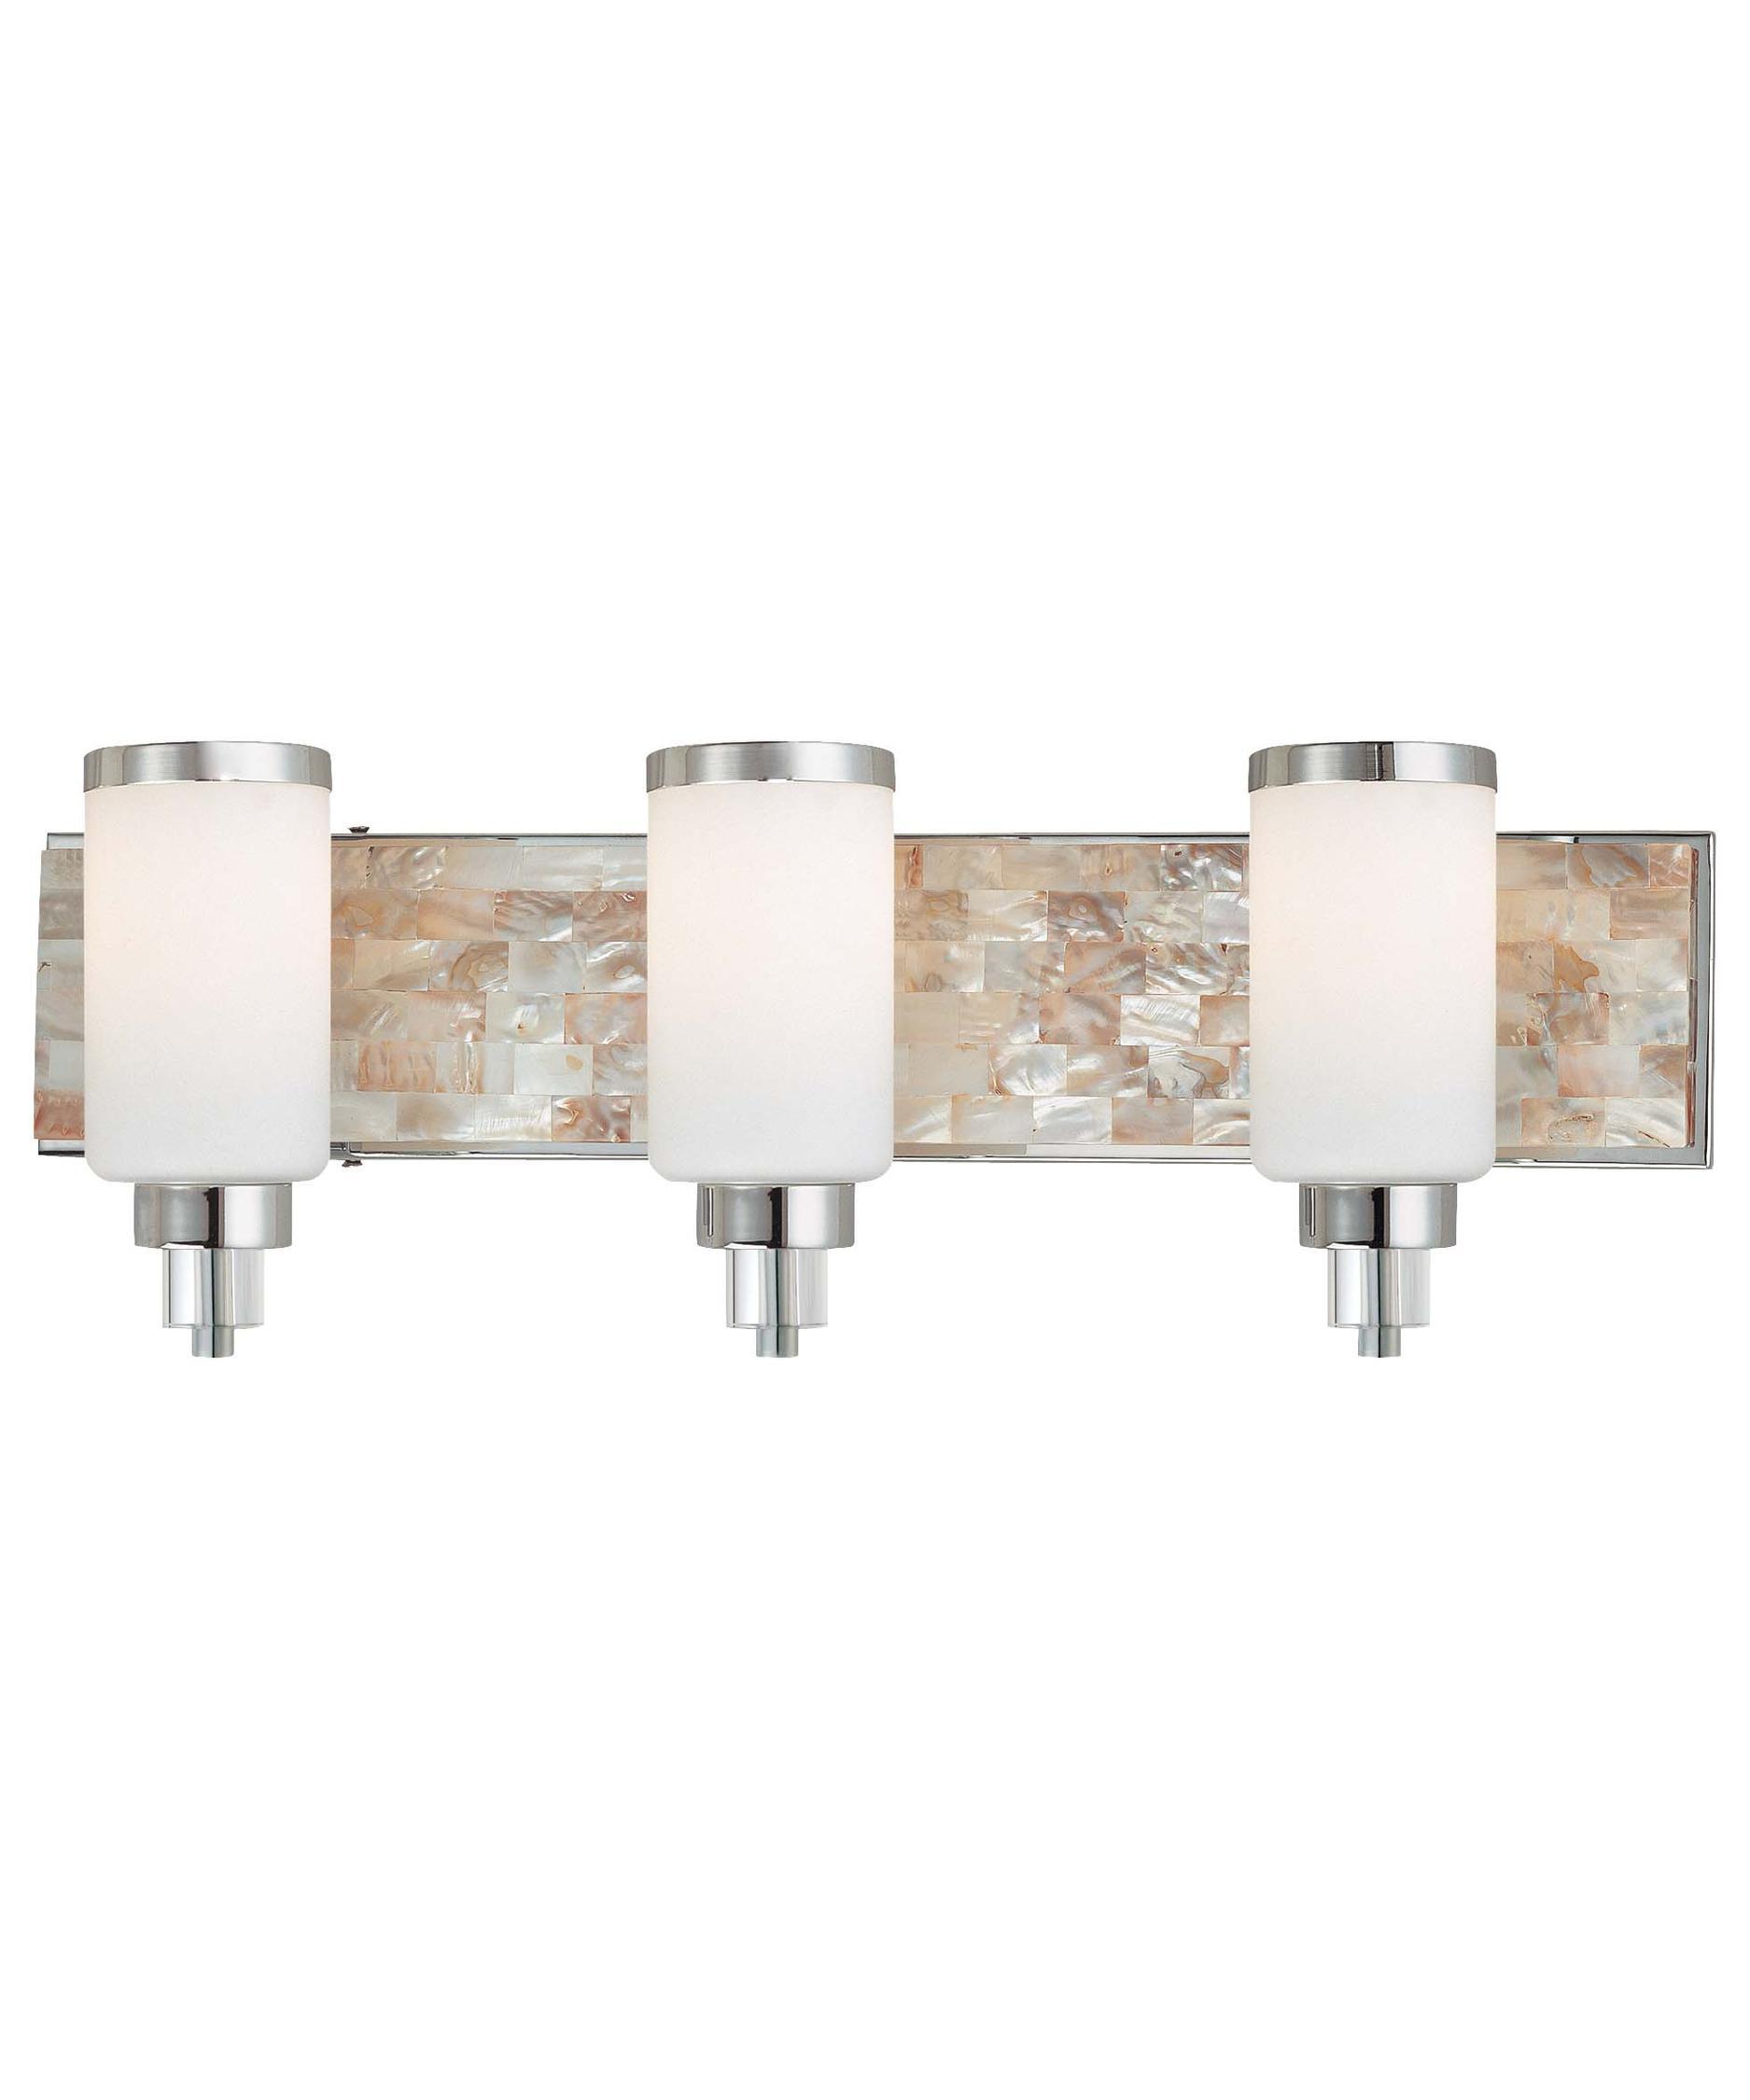 Minka Lavery 3243 Cashelmara 26 Inch Wide Bath Vanity Light | Capitol  Lighting 1 800lighting.com